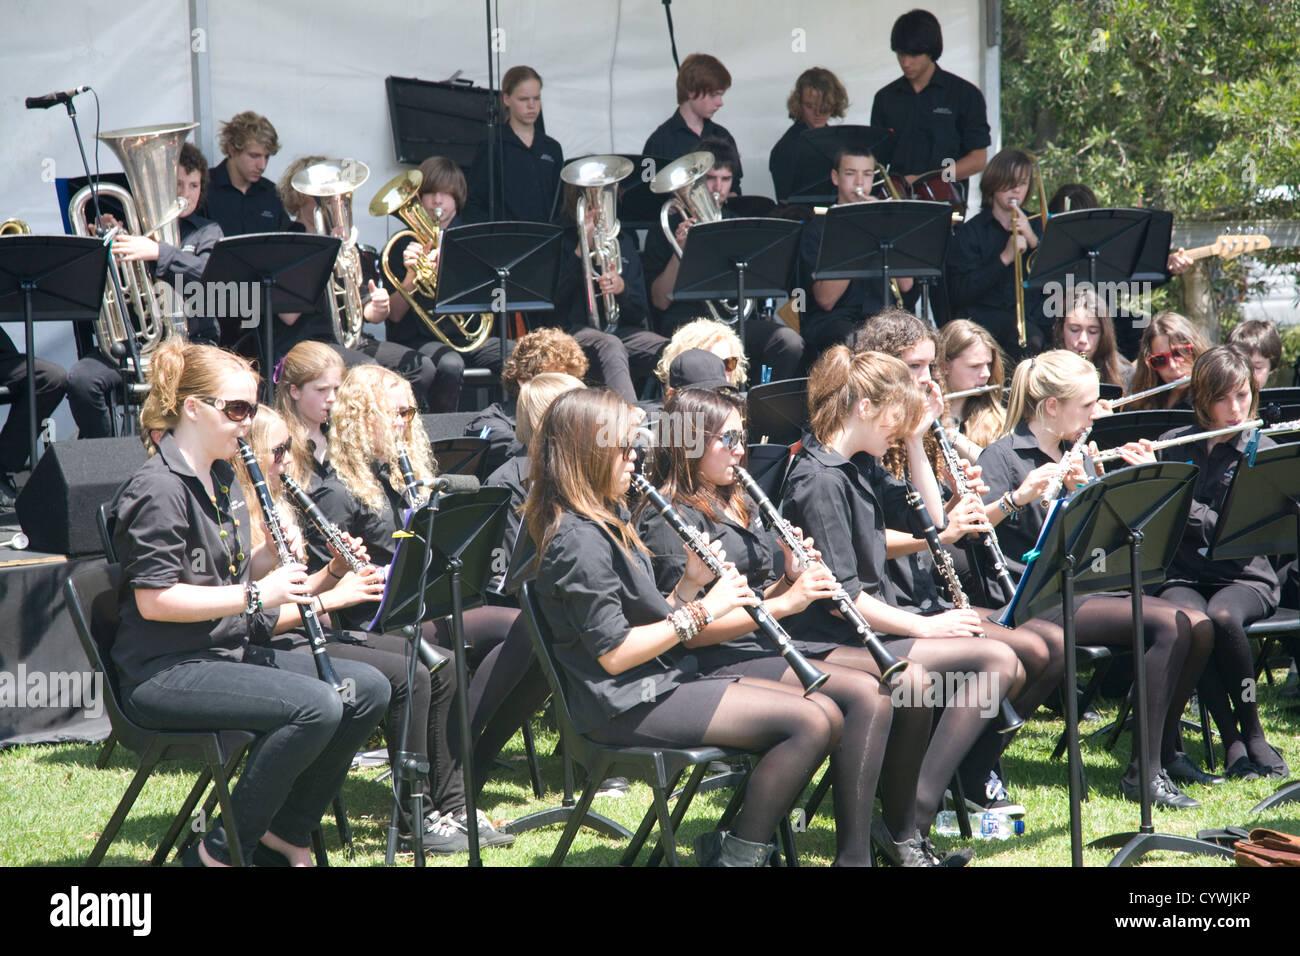 australian school children performing in the school music band,sydney,australia - Stock Image